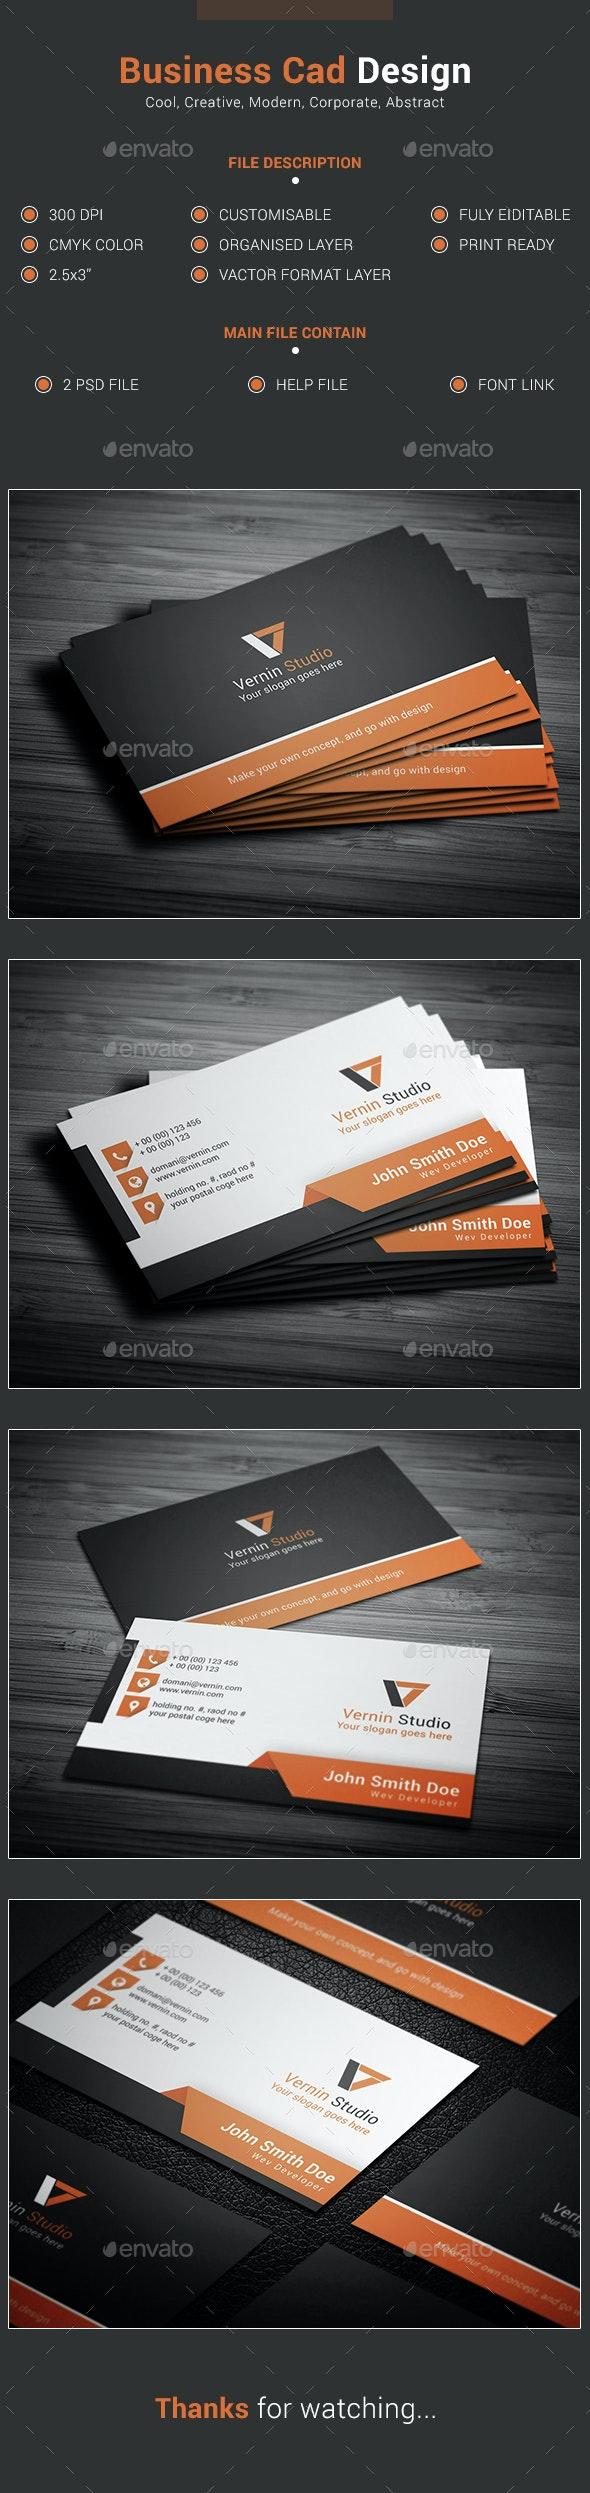 Vernin Business Card Design - Business Cards Print Templates